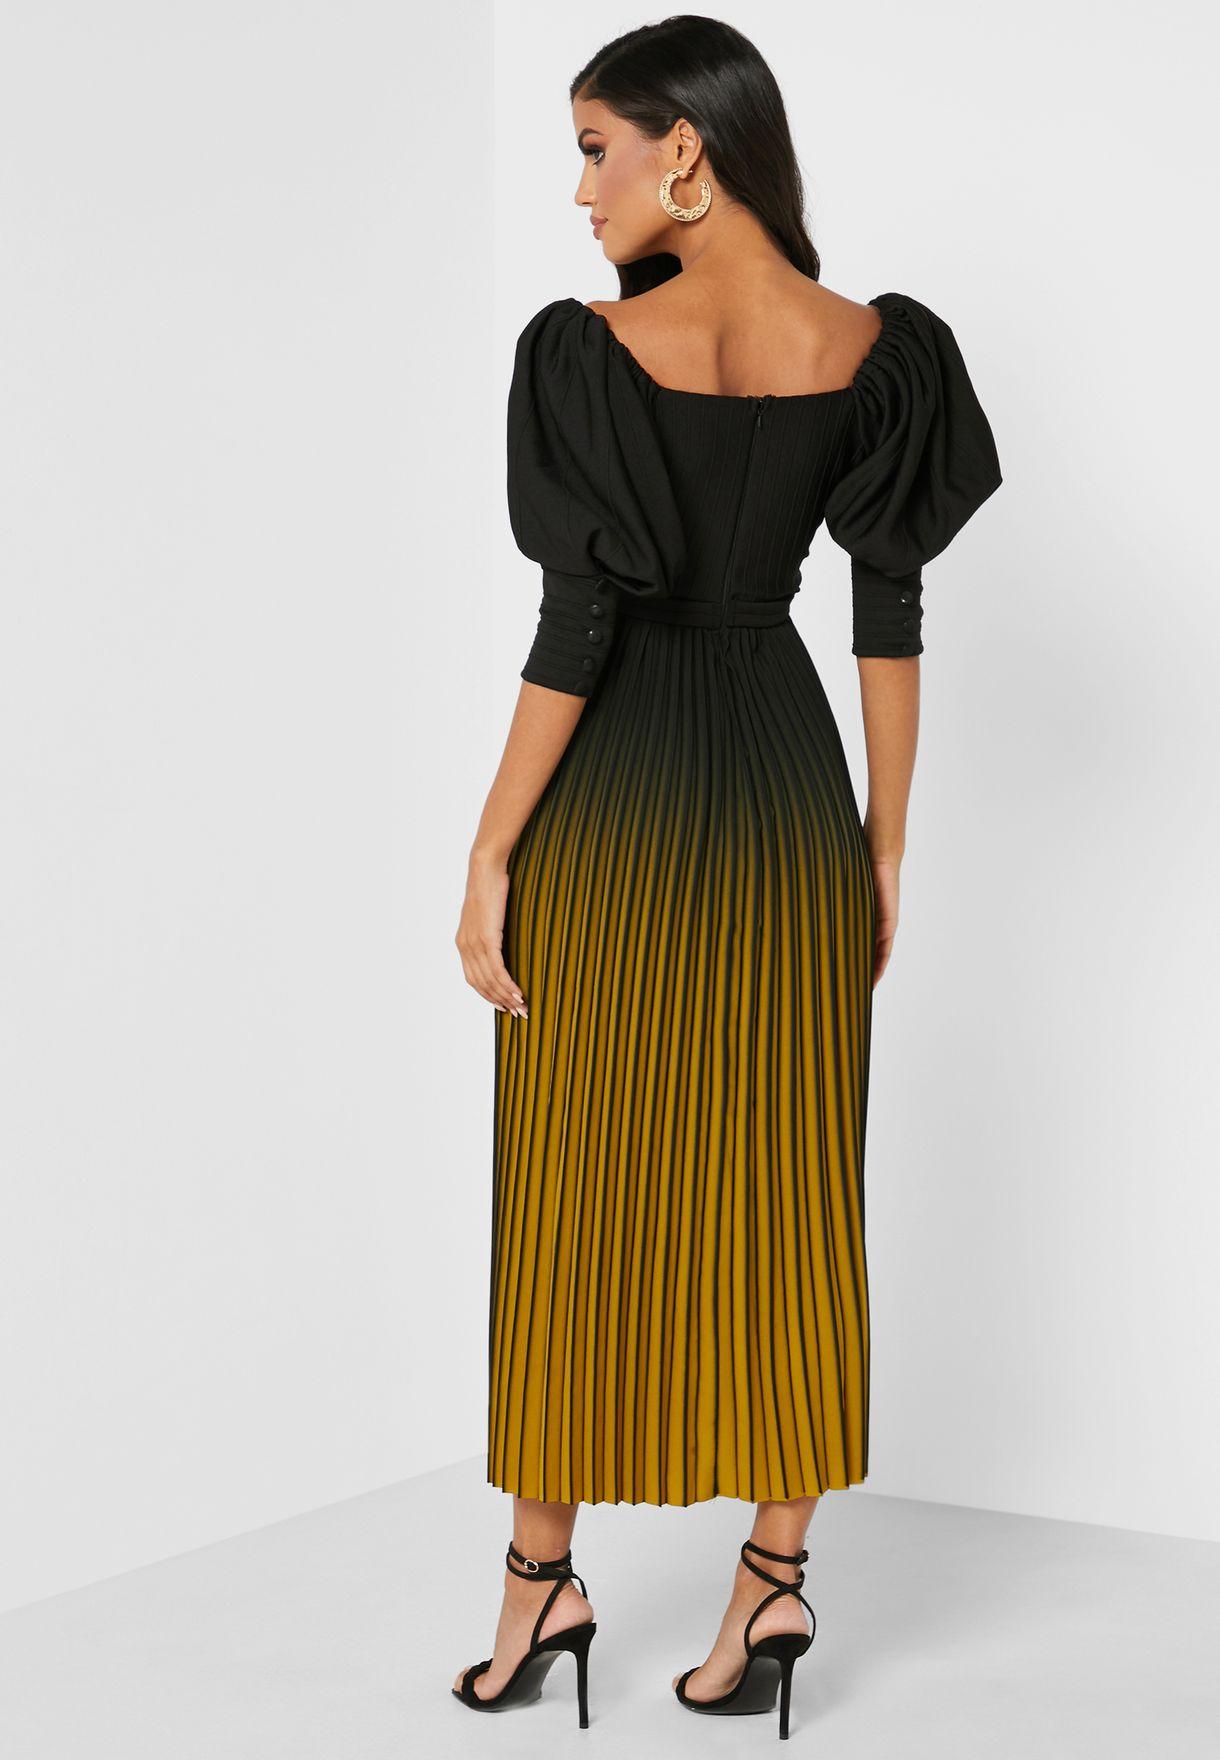 Pleated Puff Sleeves Dress